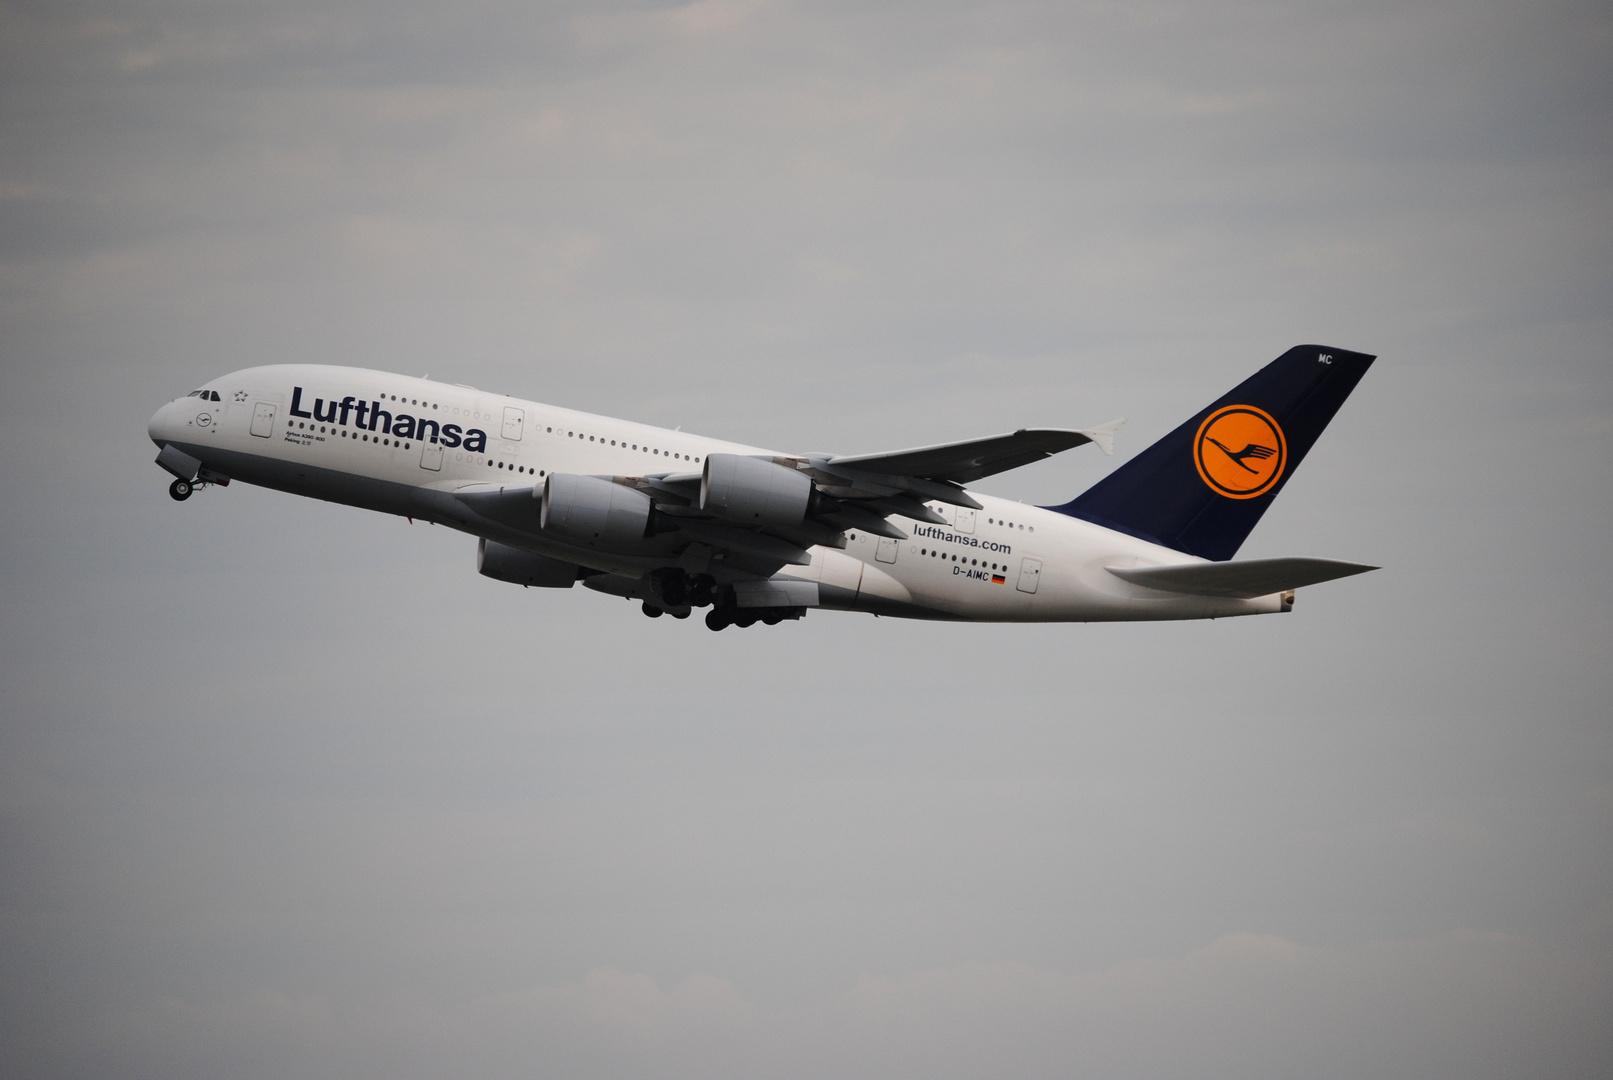 Lufthansa Airbus A380-800 Peking